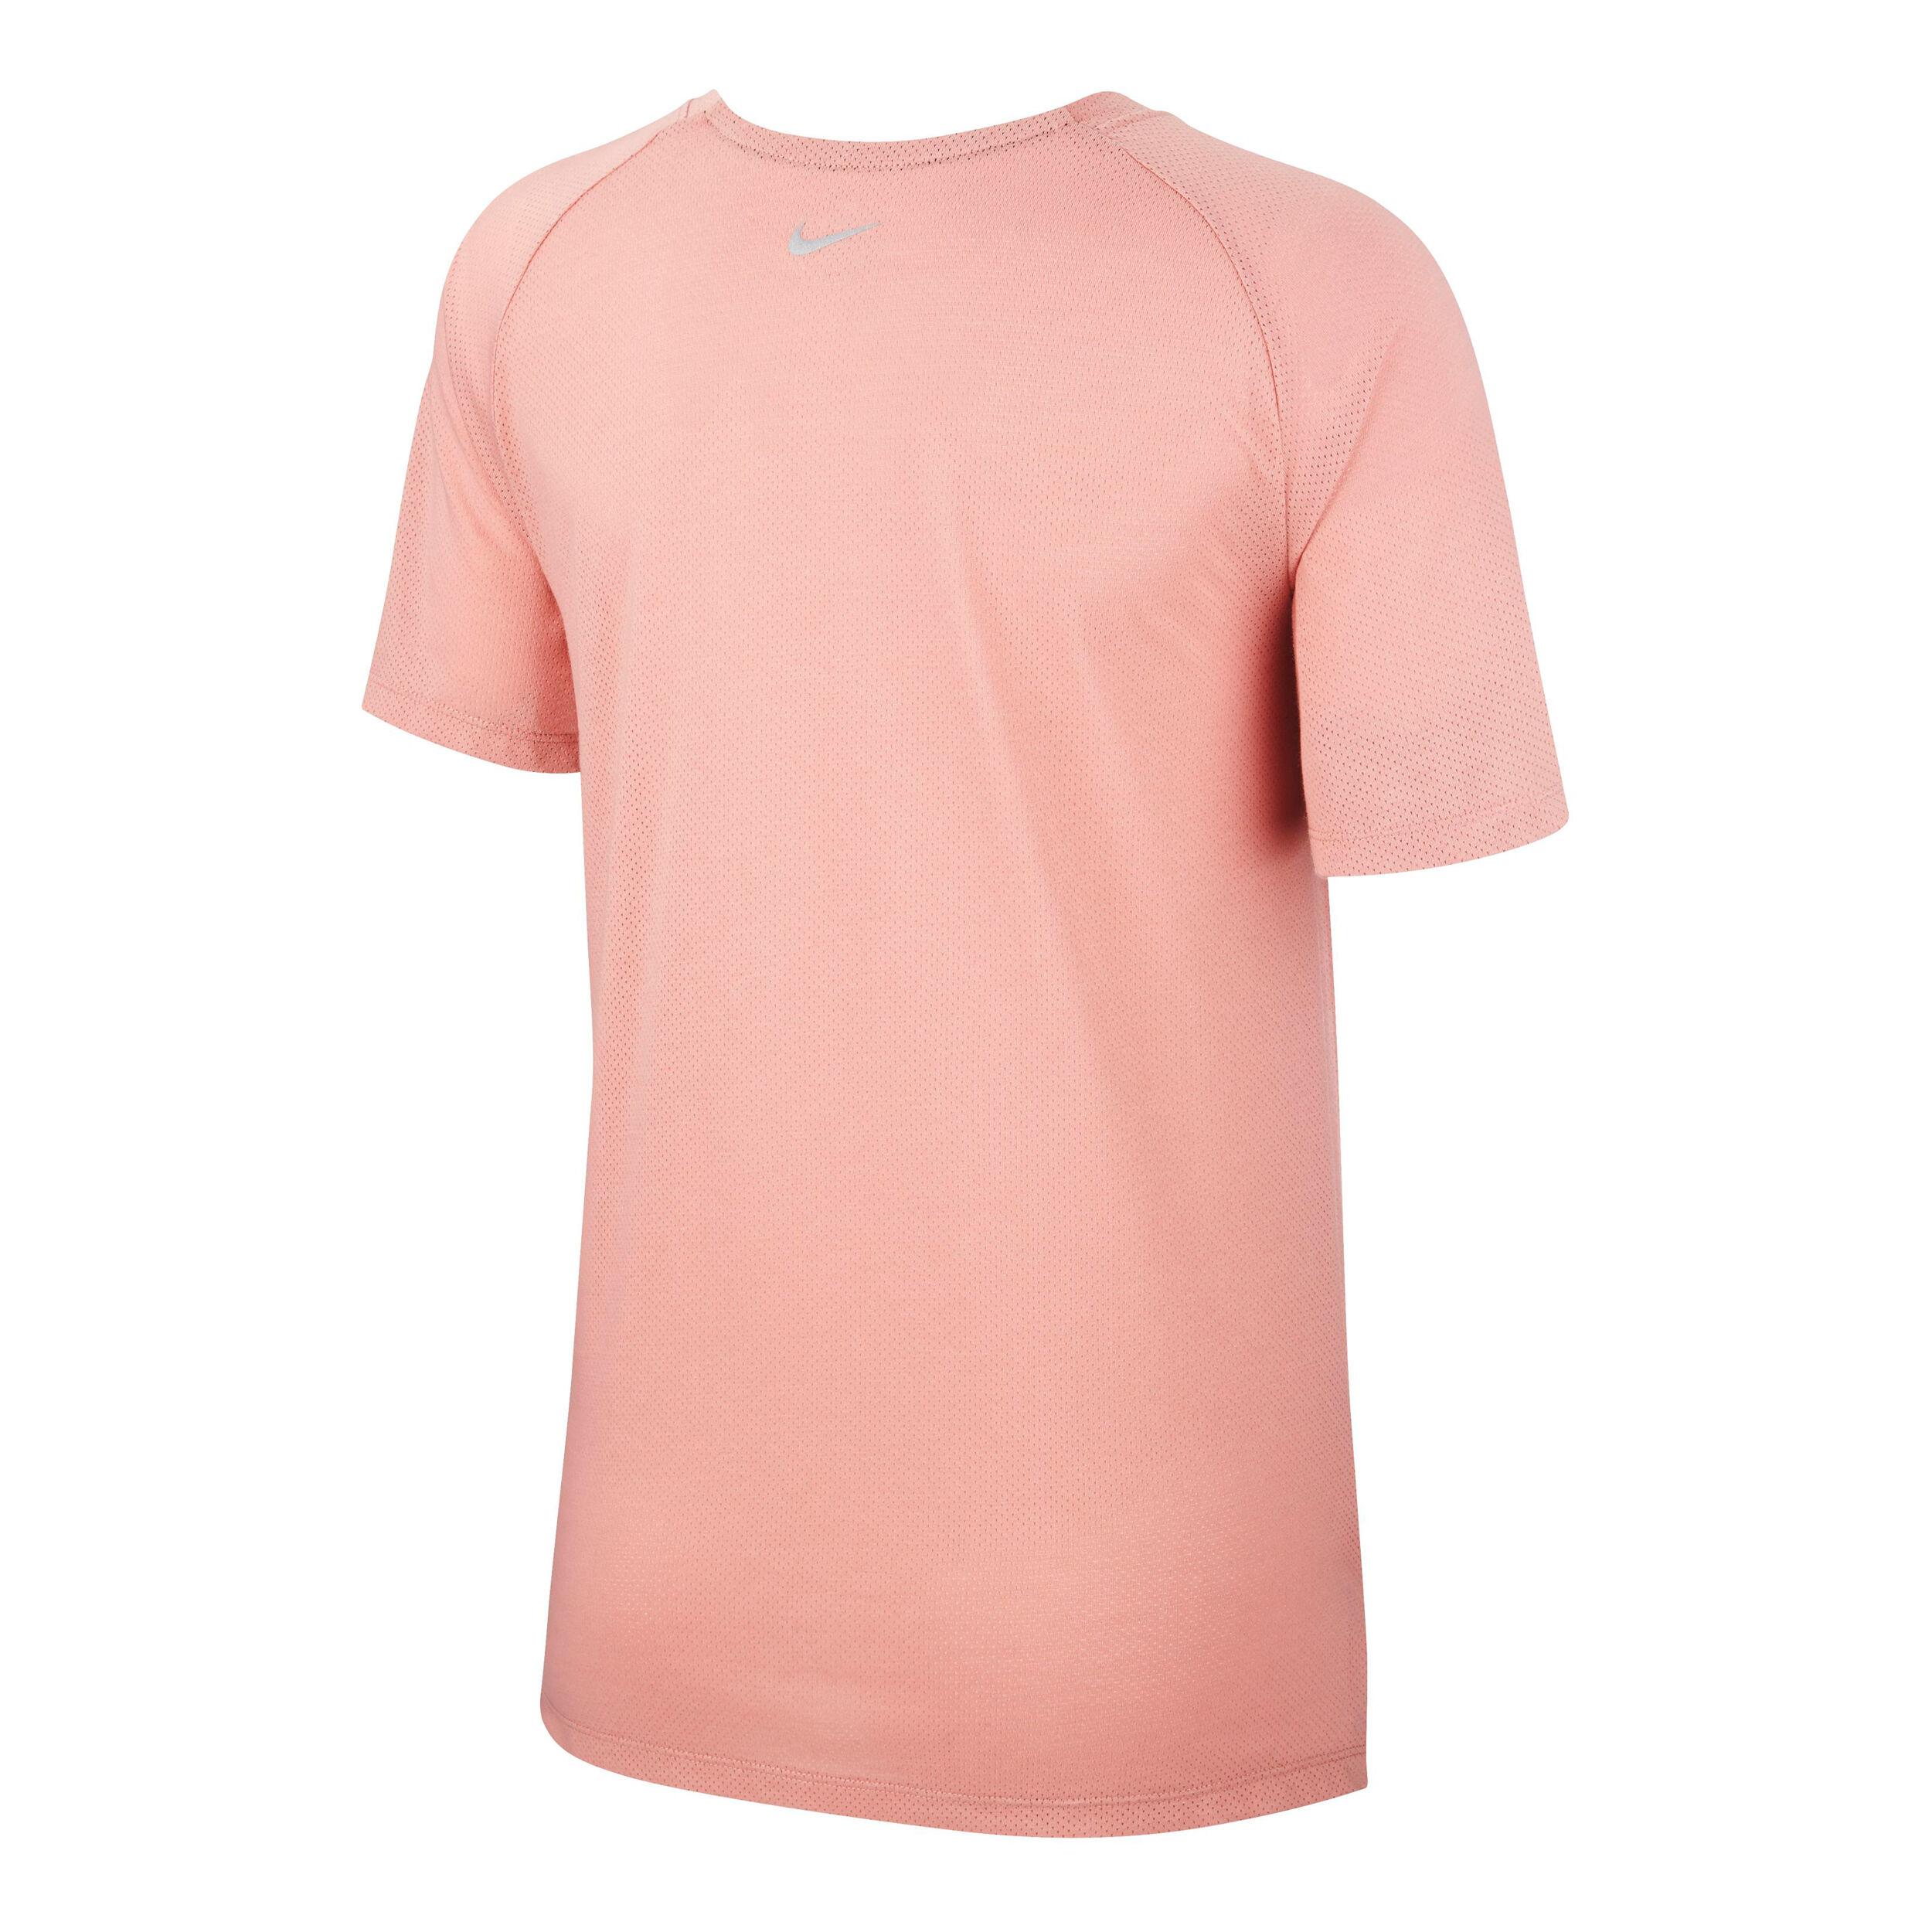 Women's Nike T Shirts | Nike Running & Gym T Shirts | Next UK